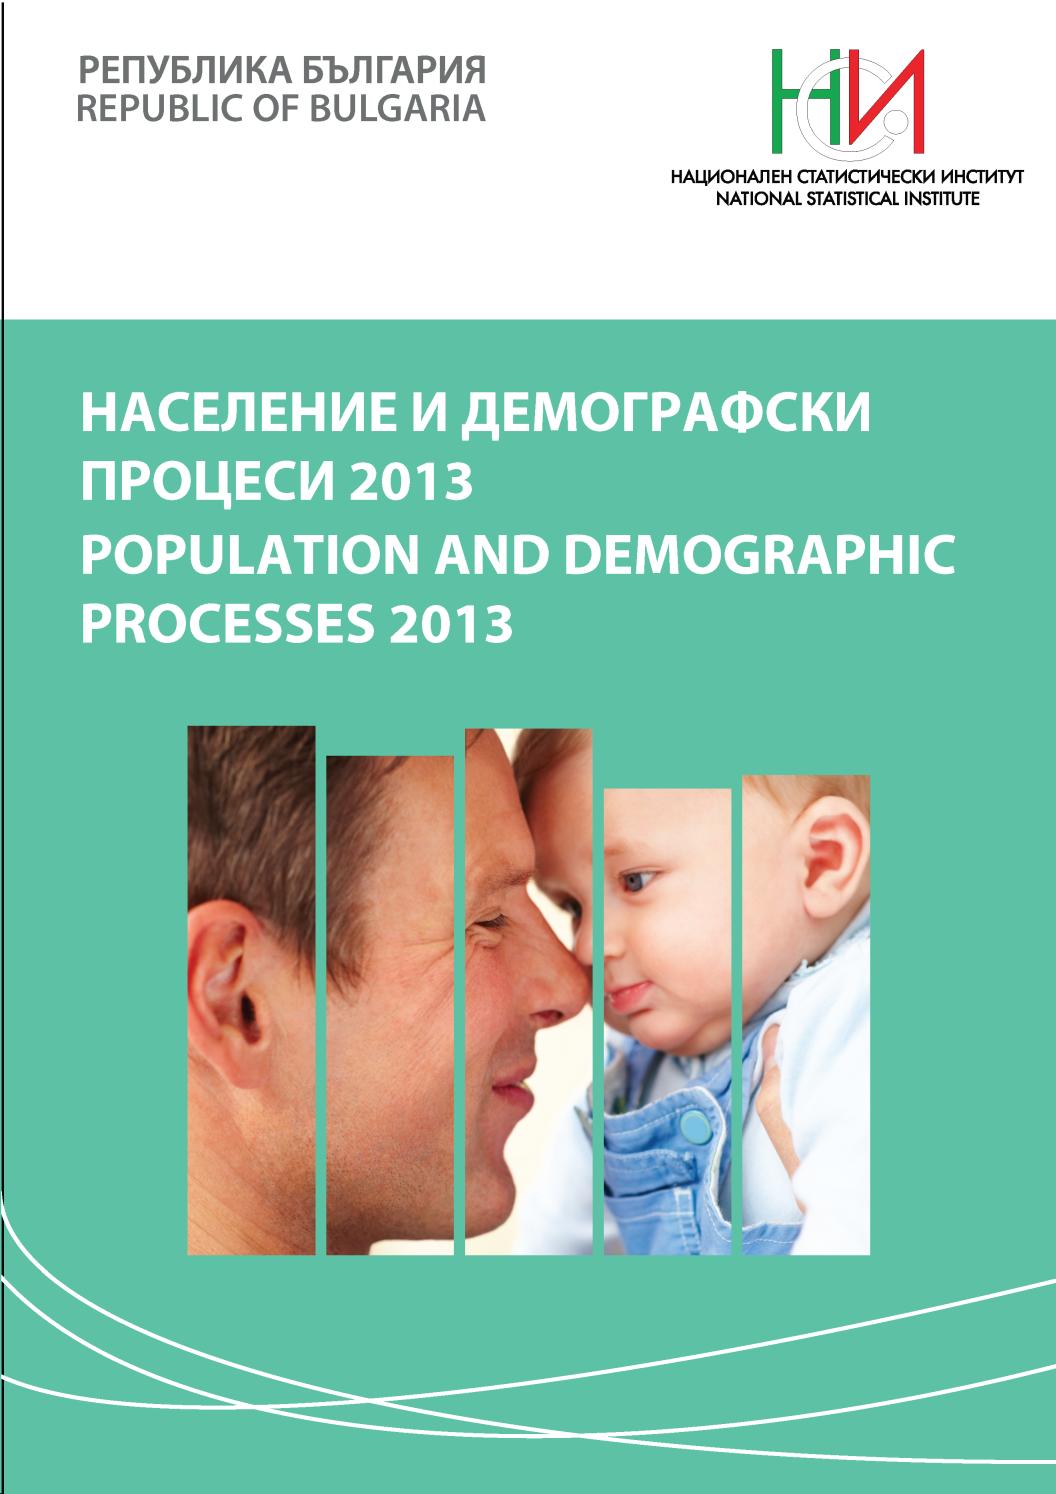 Население и демографски процеси 2013